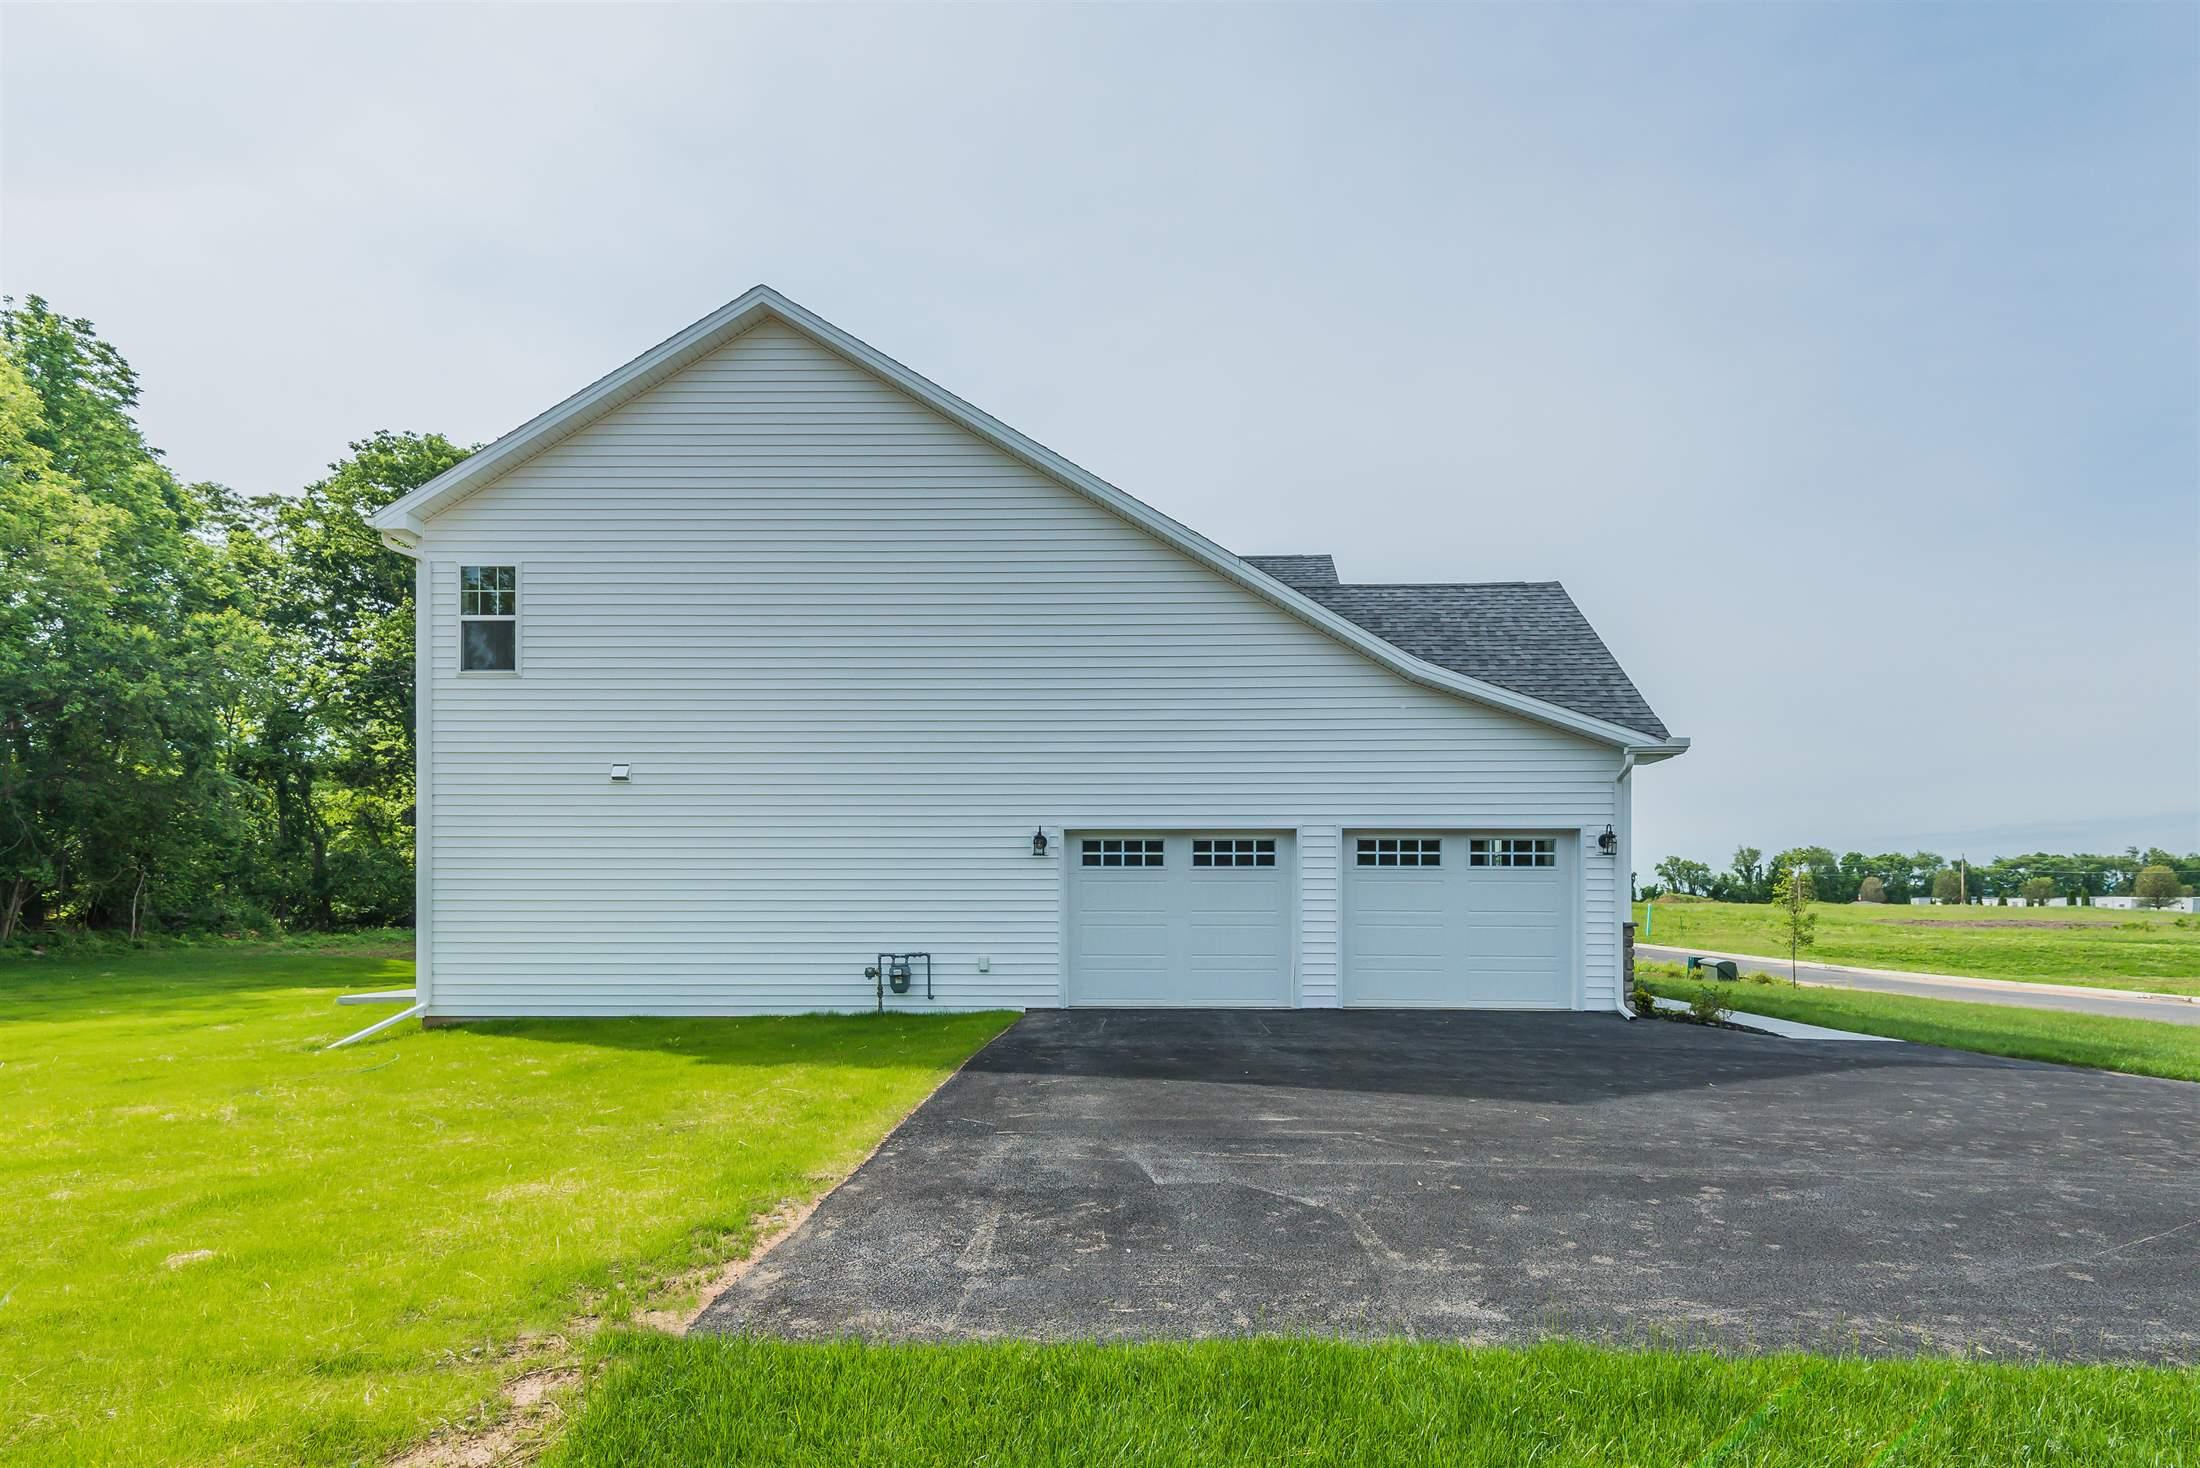 103 Steven Drive, Mechanicsburg, PA 17050